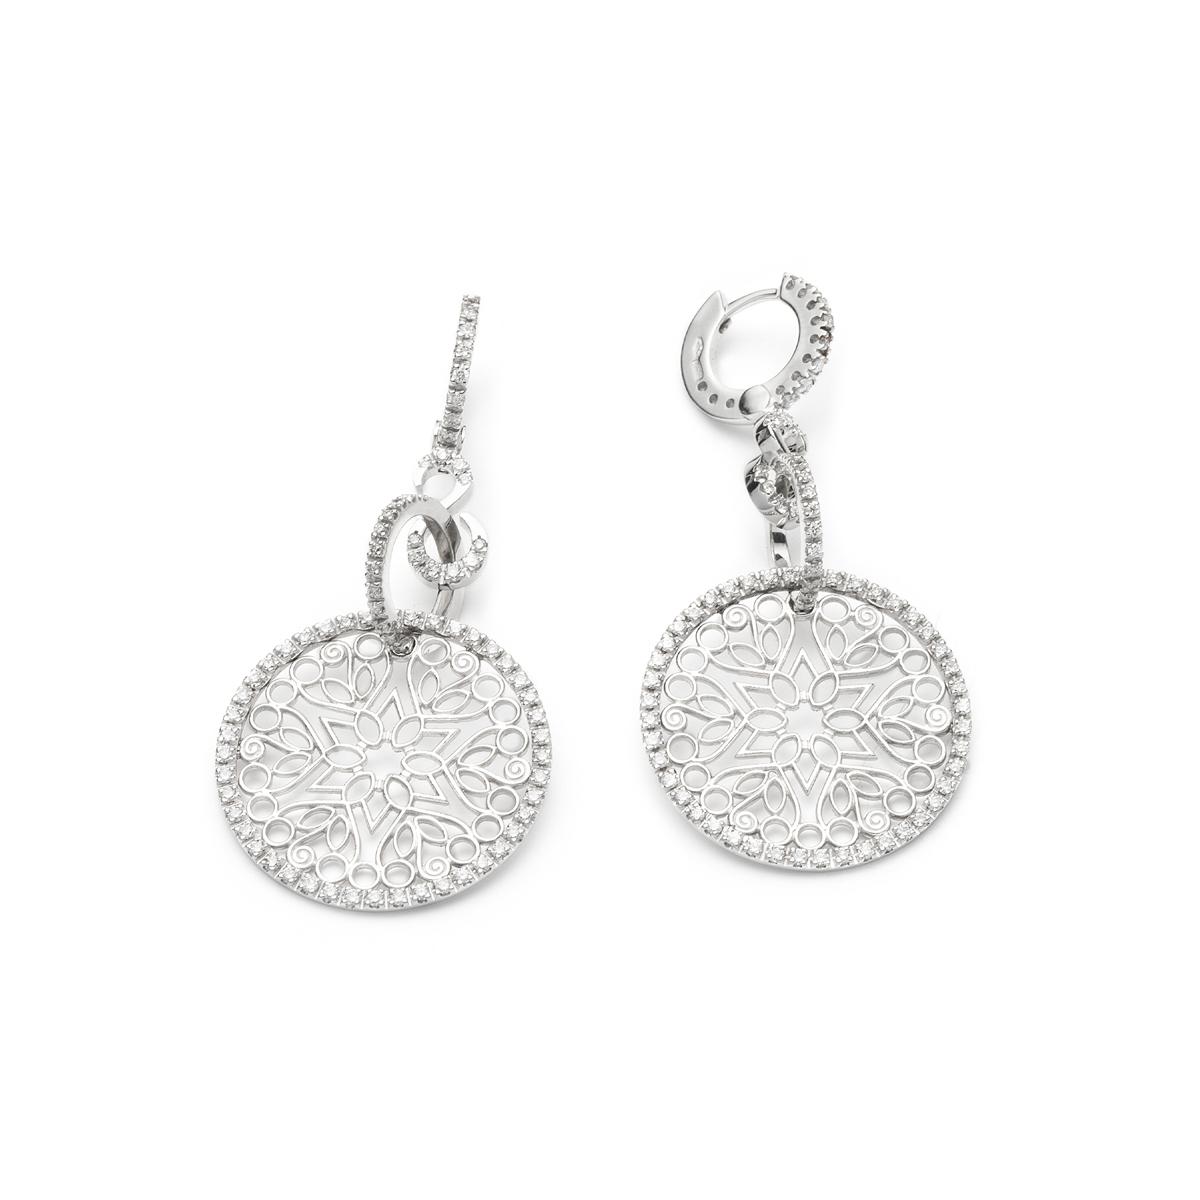 Circledrop Earrings